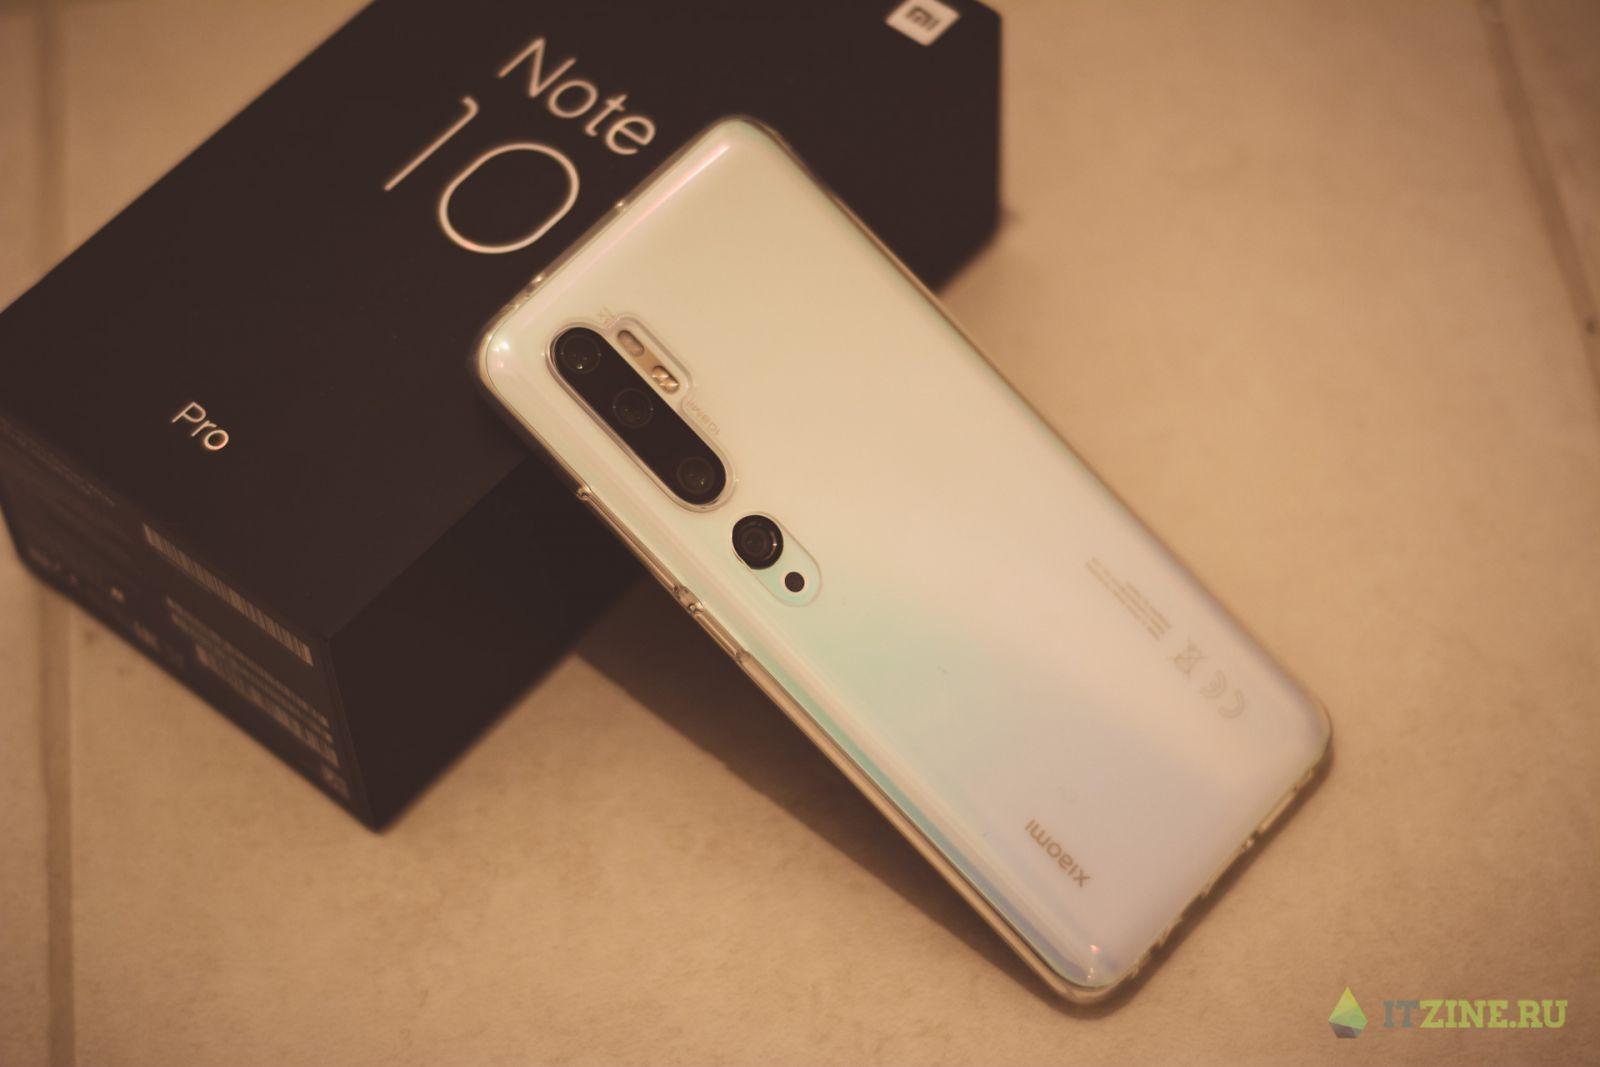 Обзор Xiaomi Mi Note 10 Pro. Добротный флагман (dsc 8058)